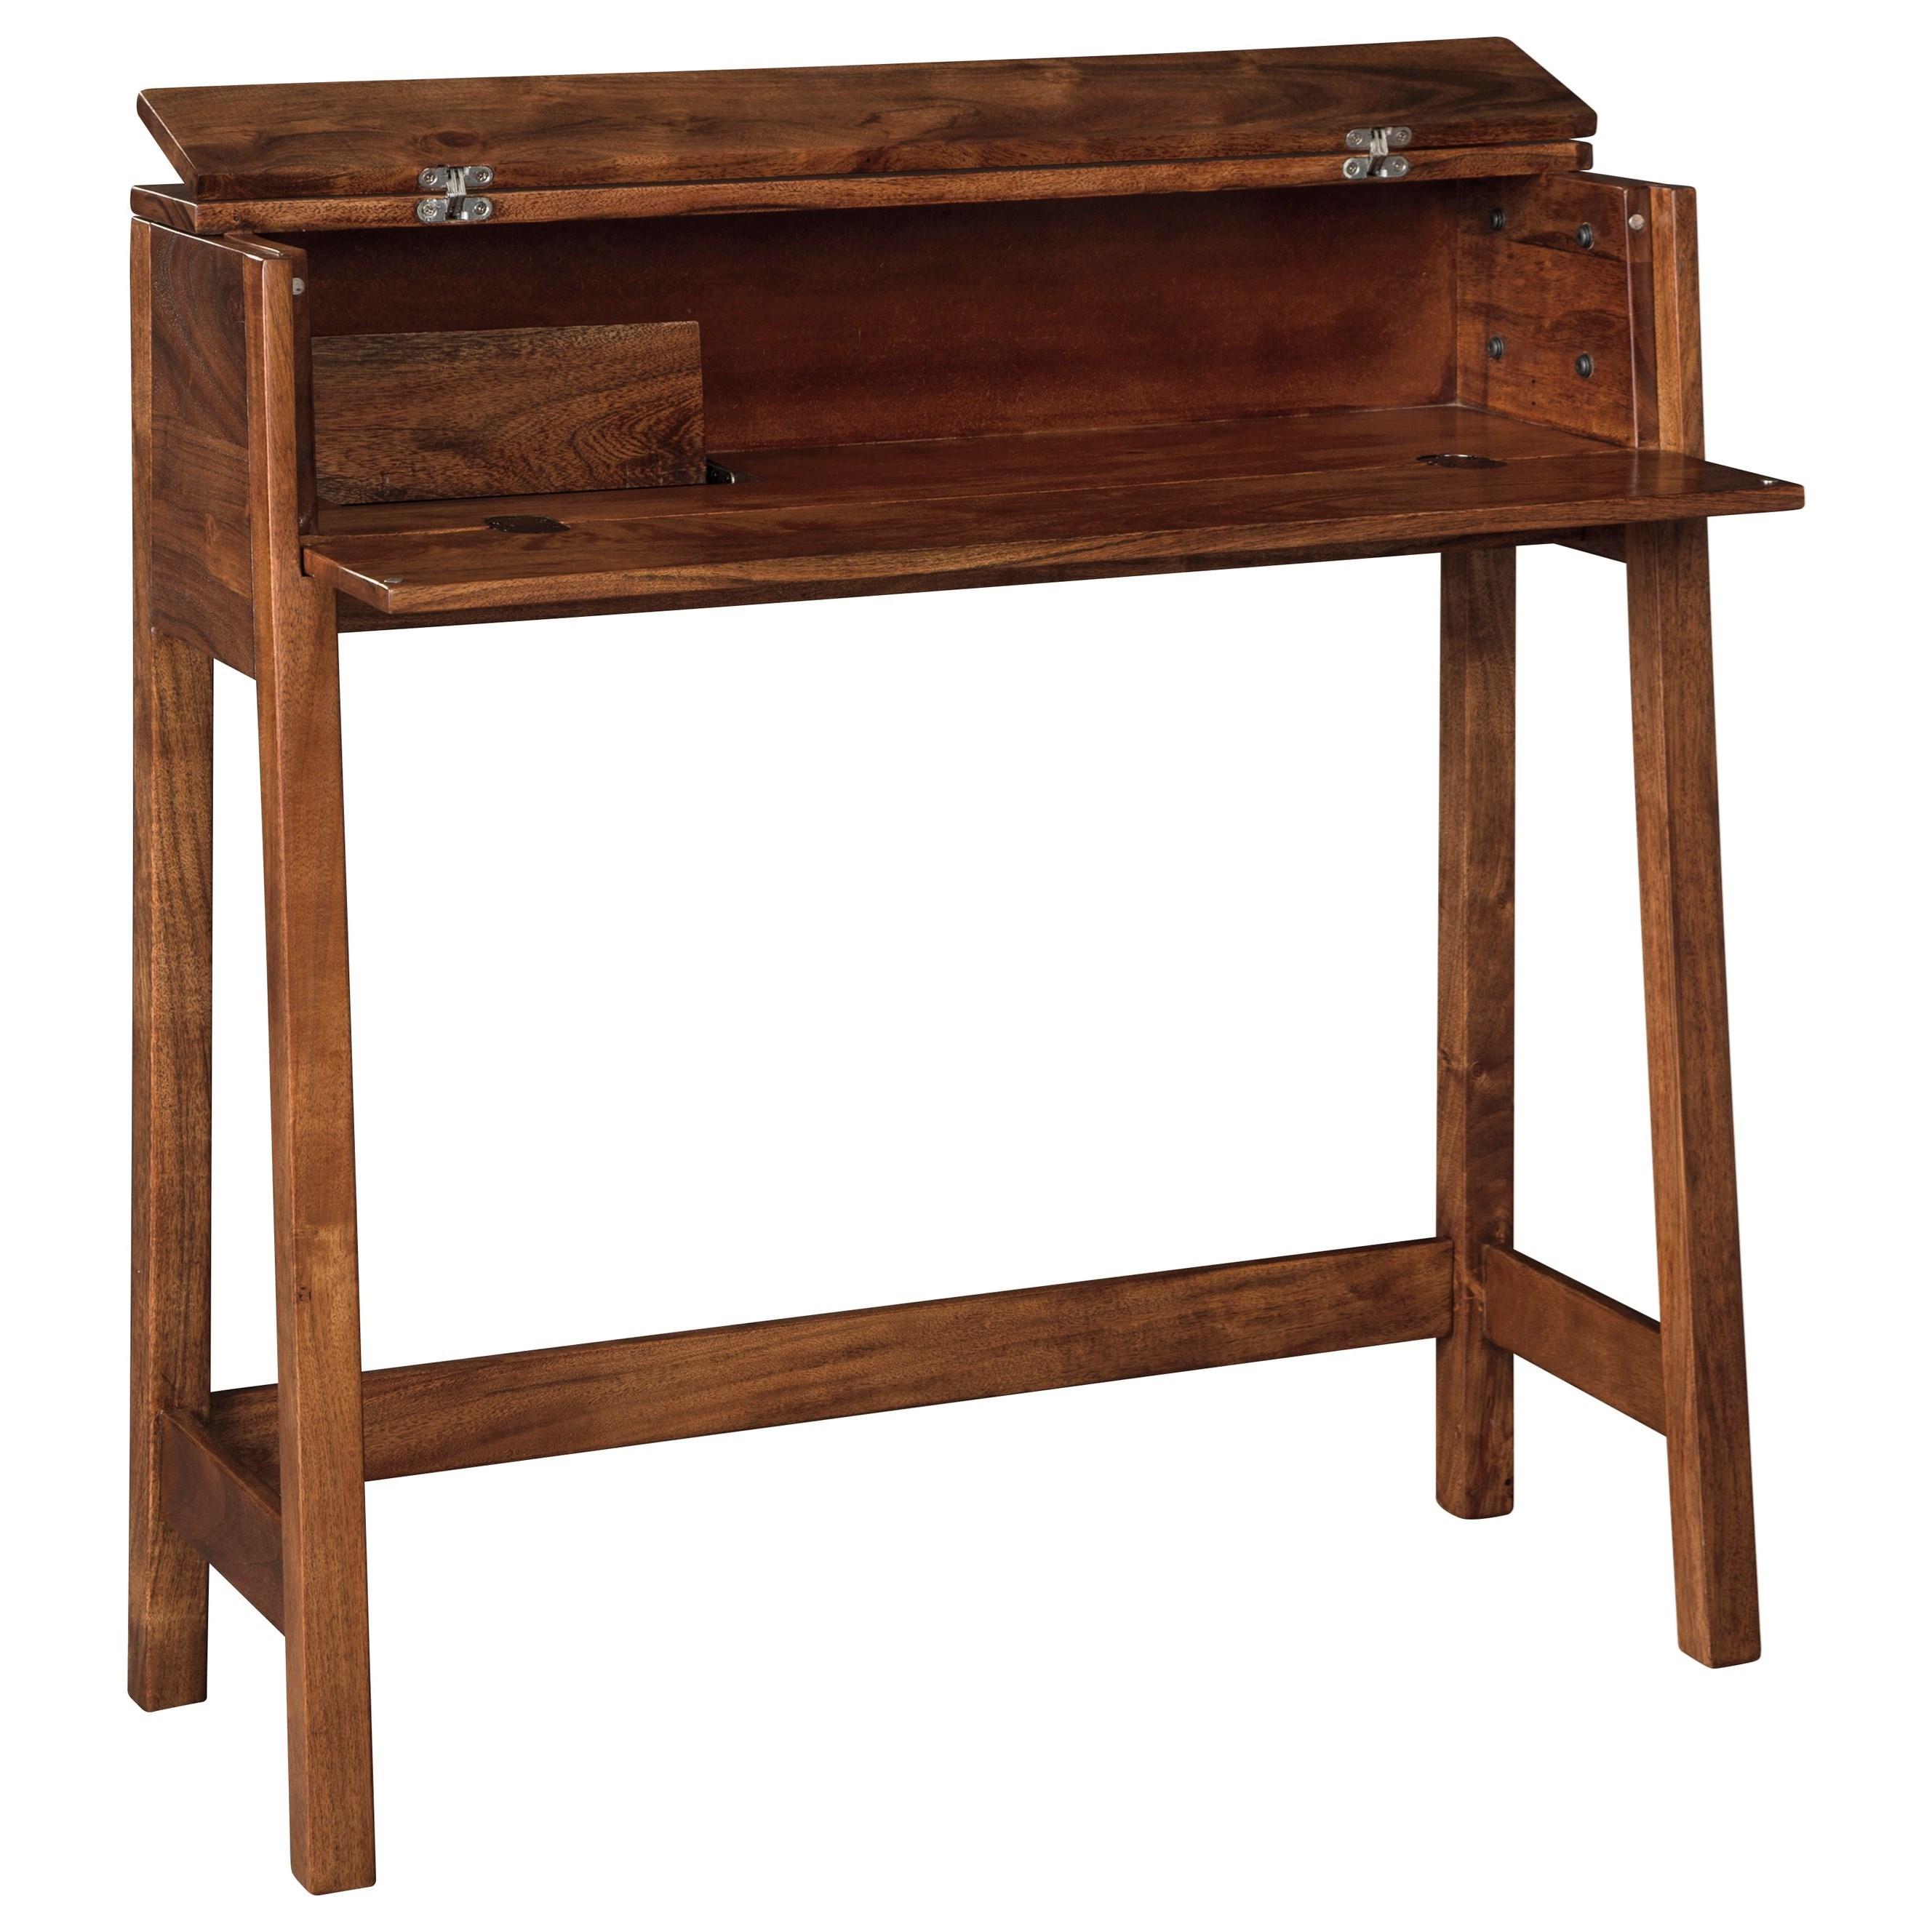 Solid Wood Console Sofa/Secretary Desk in Medium Brown Finish